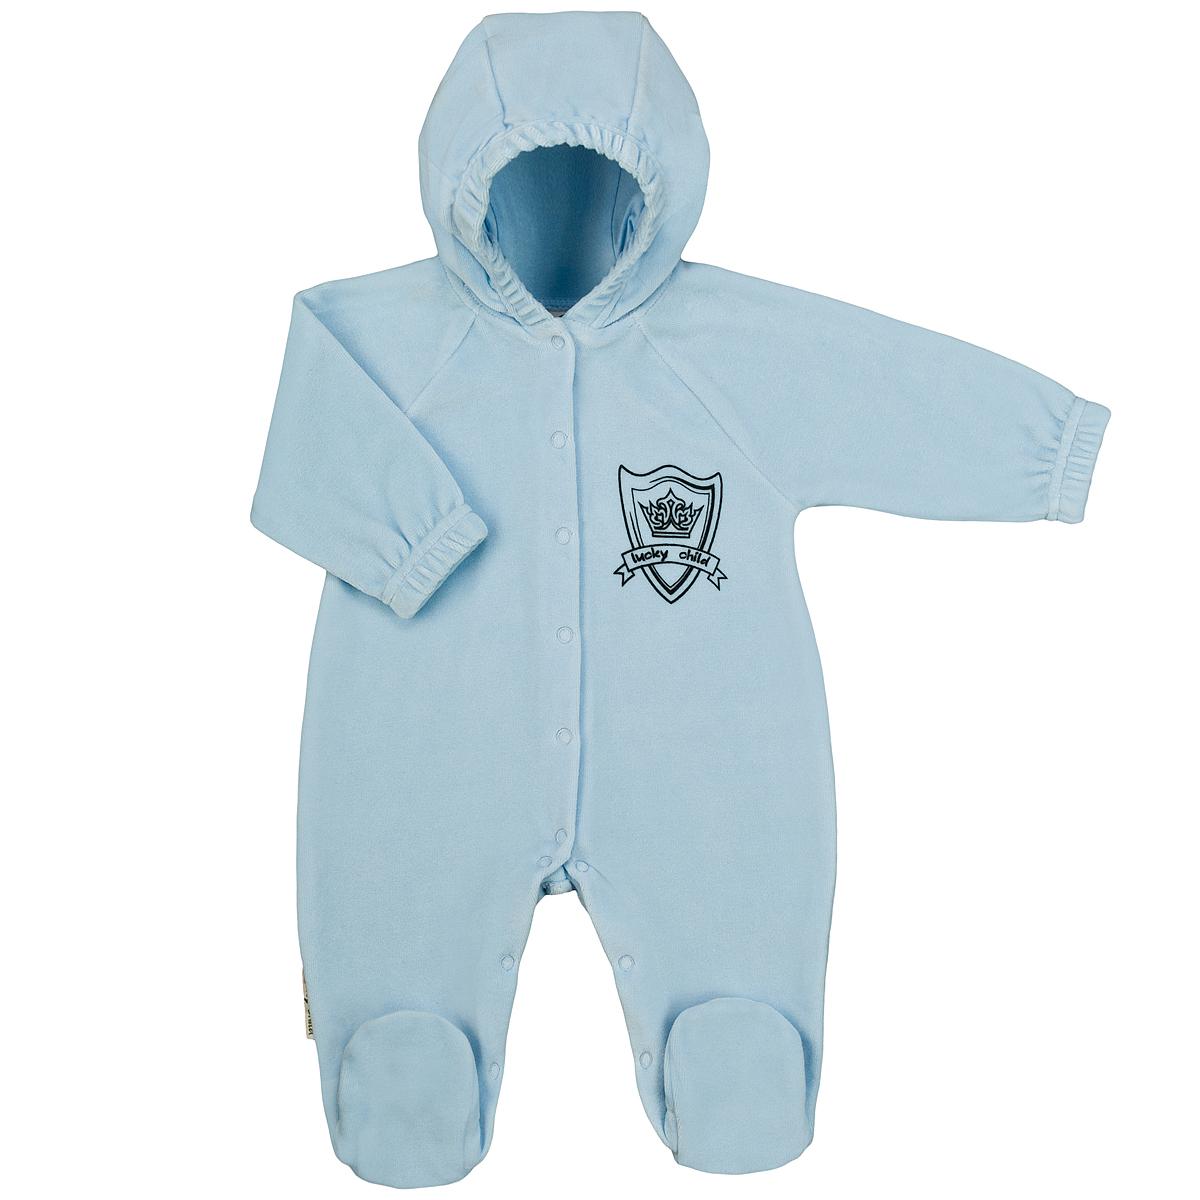 Комбинезон для мальчика Lucky Child, цвет: голубой. 3-21. Размер 80/86